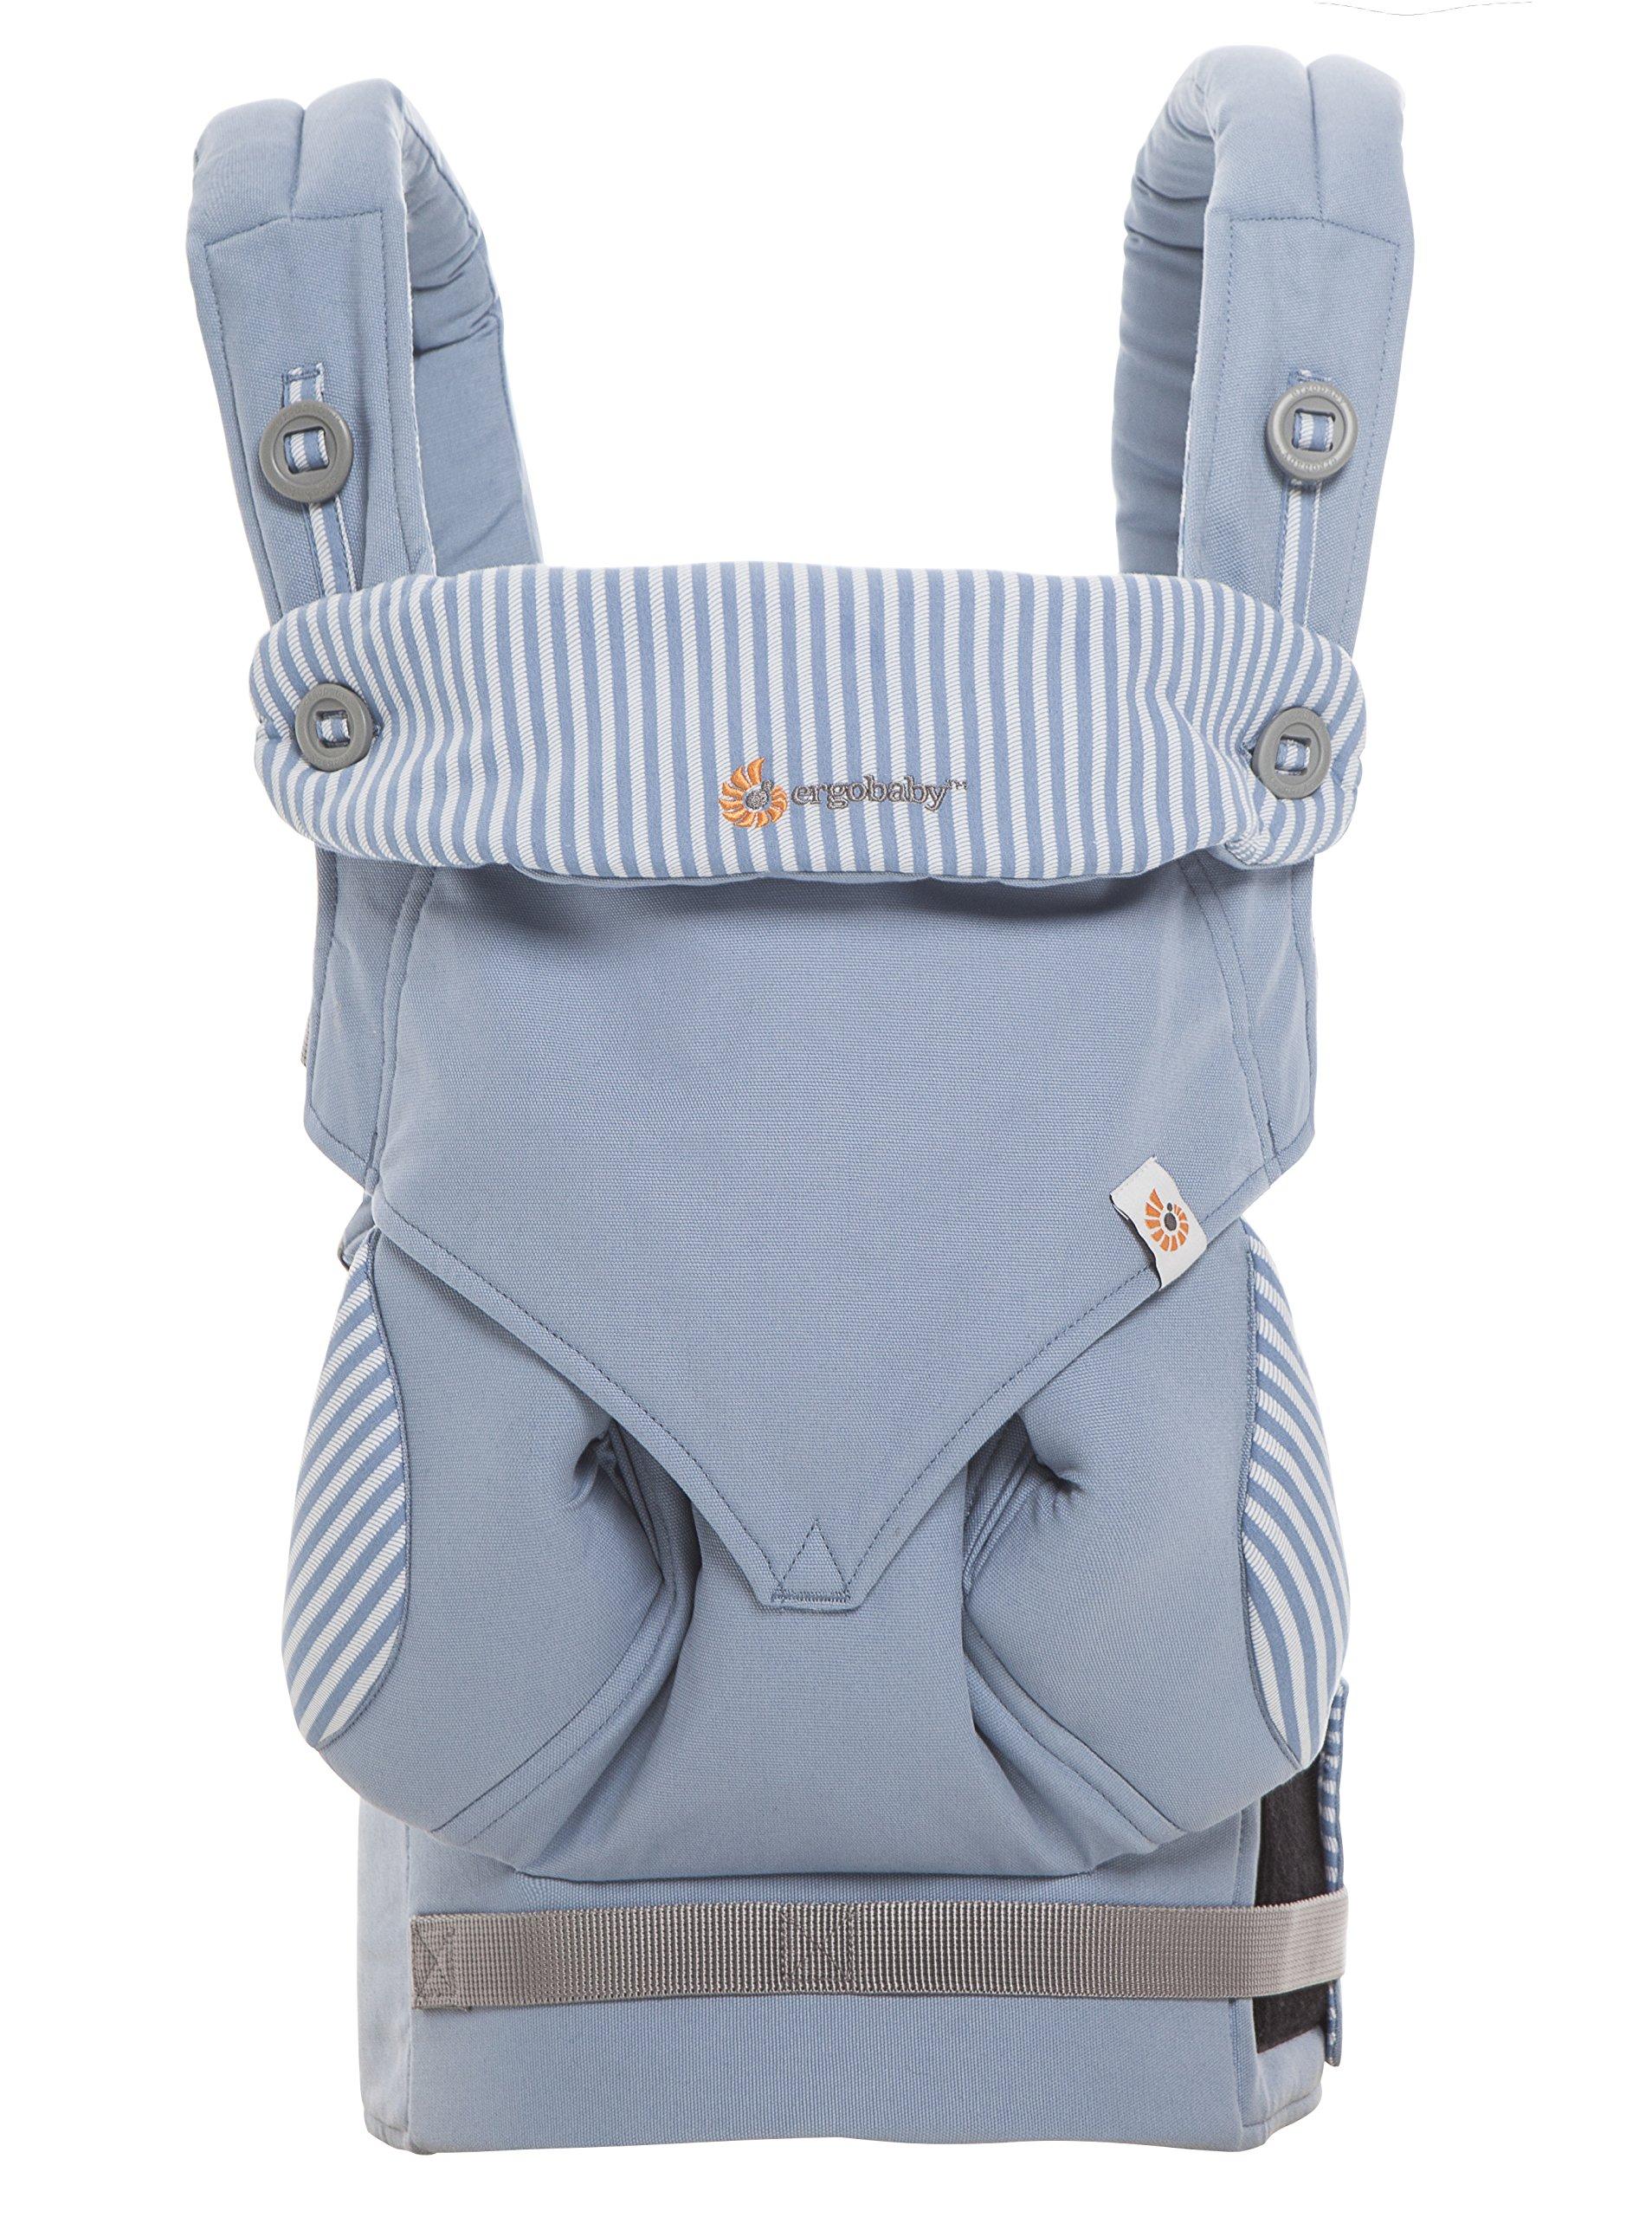 Ergobaby 4 Position 360 Baby Carrier, Azure Ergobaby Four ergonomic positions Maximum comfort for parent Comfort & proper ergonomics for baby 3